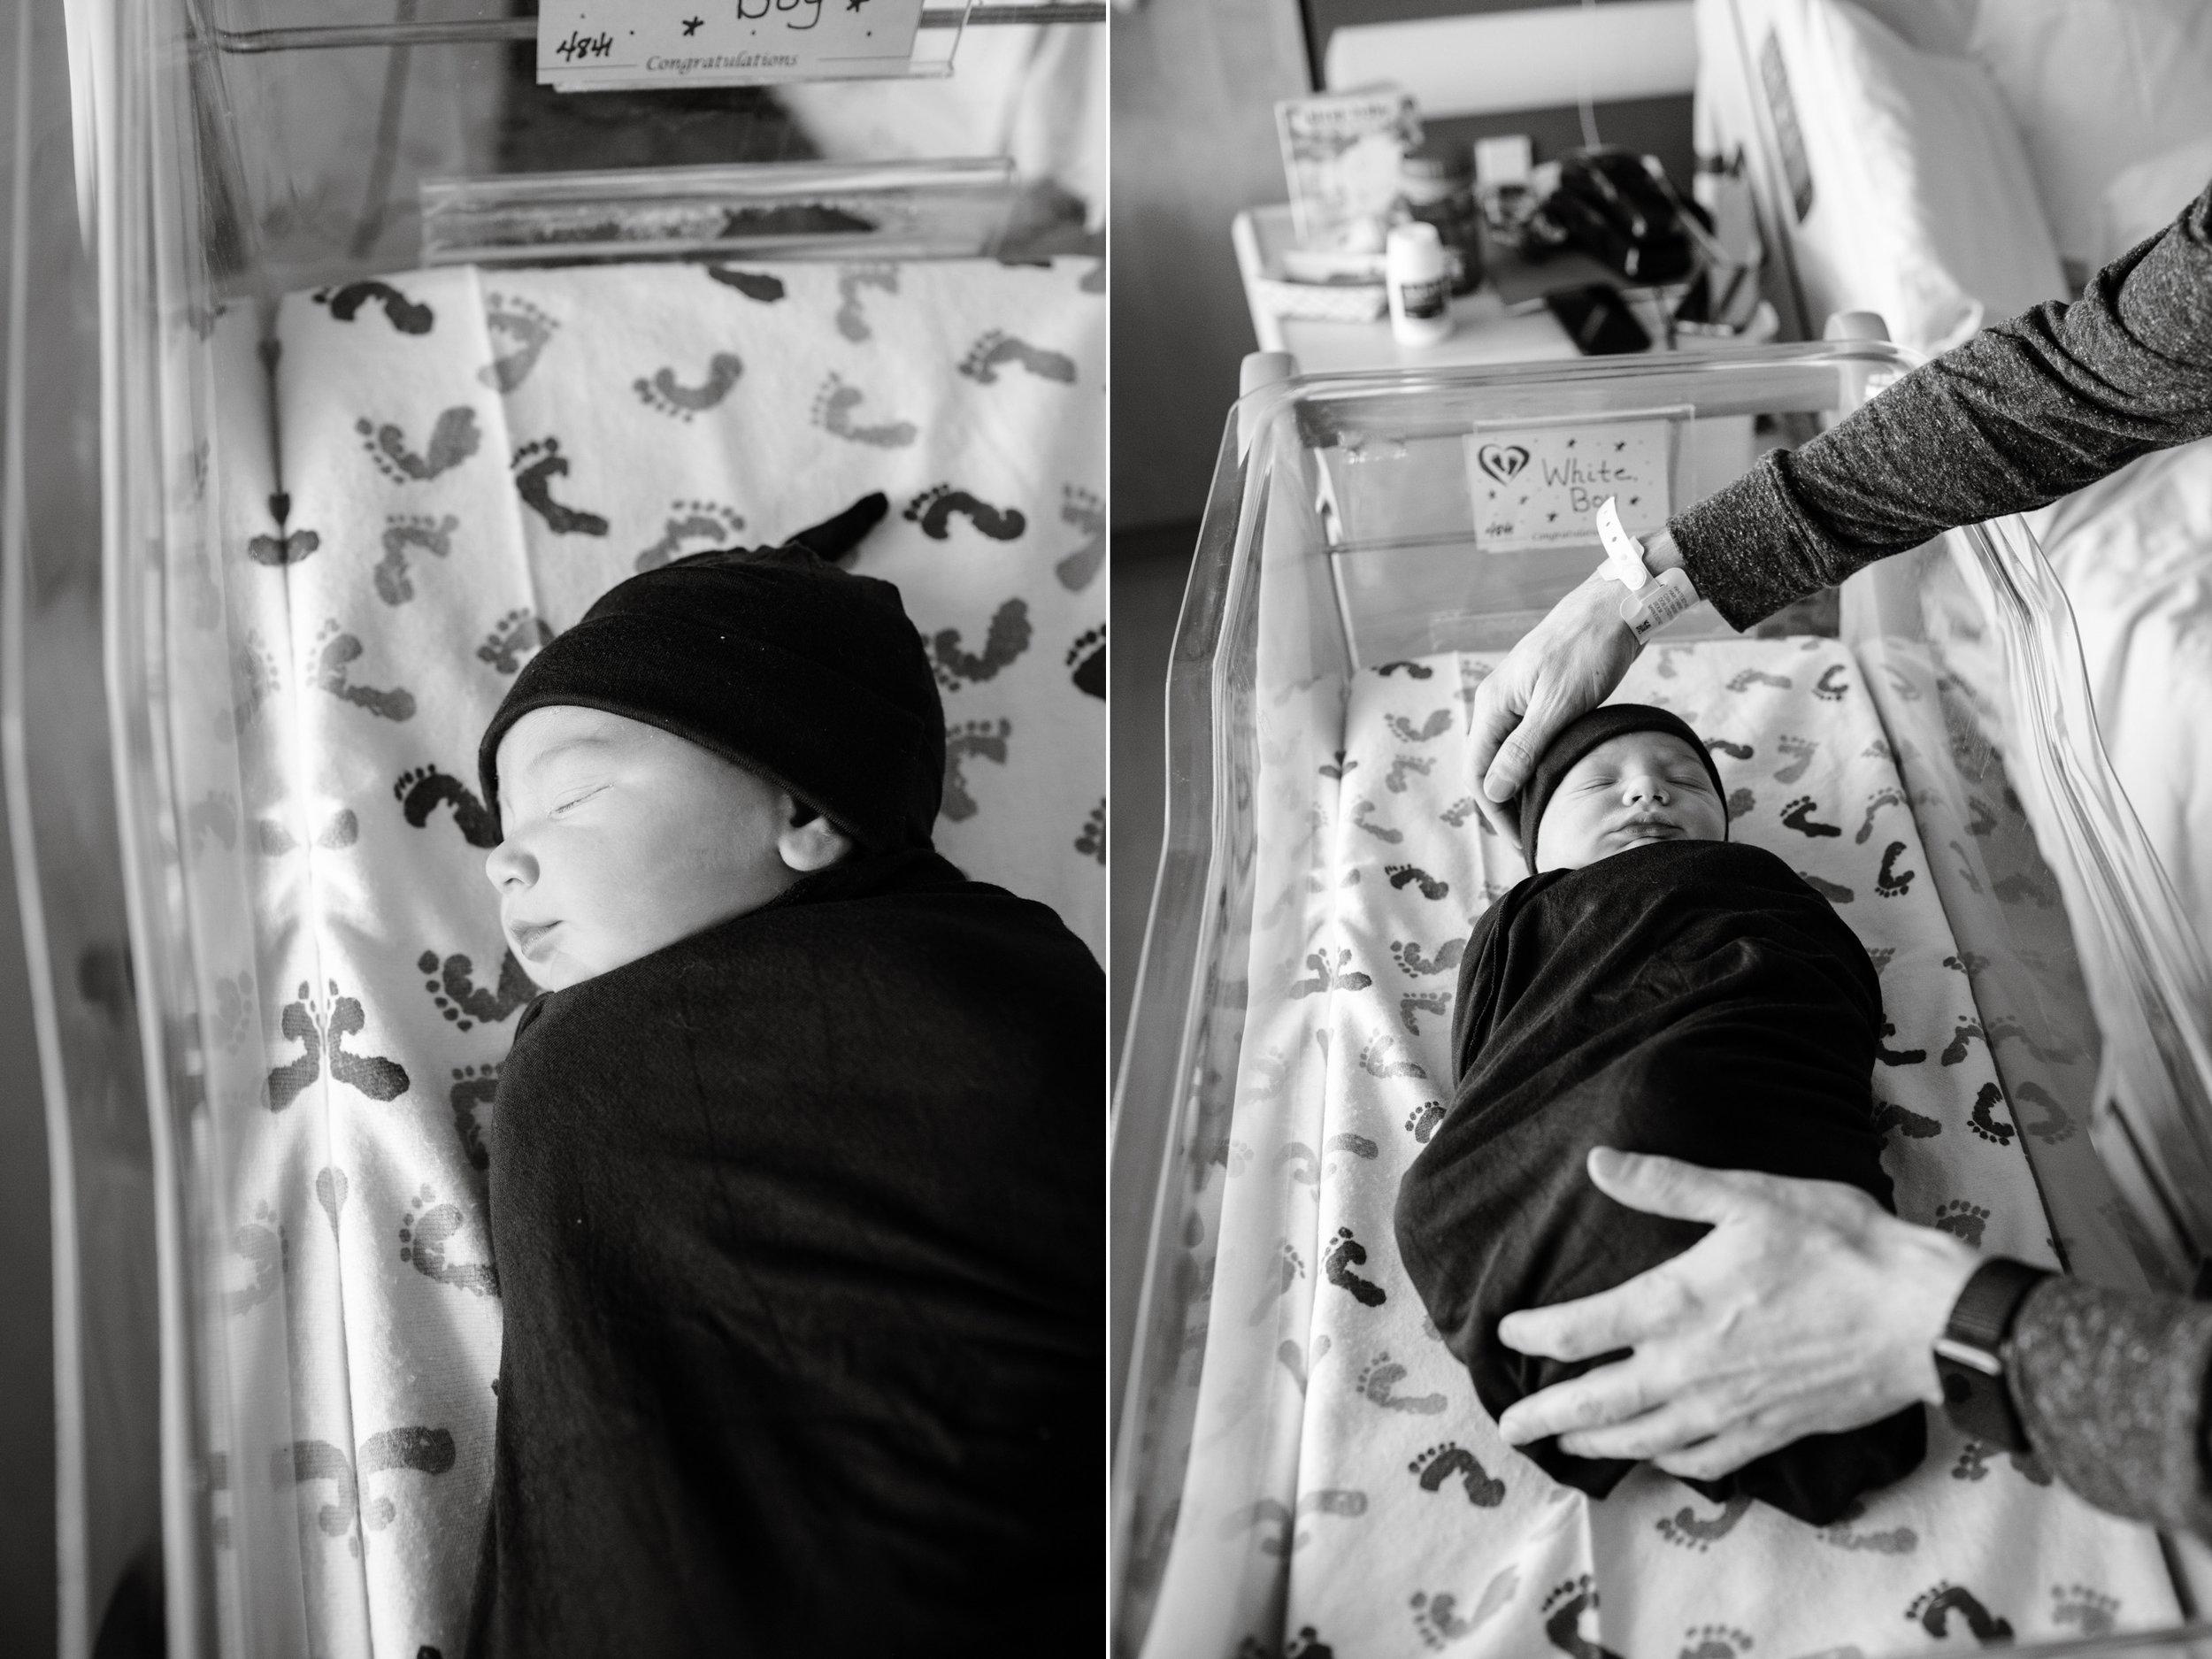 maine-newborn-photography-stepheneycollins -2a.jpg